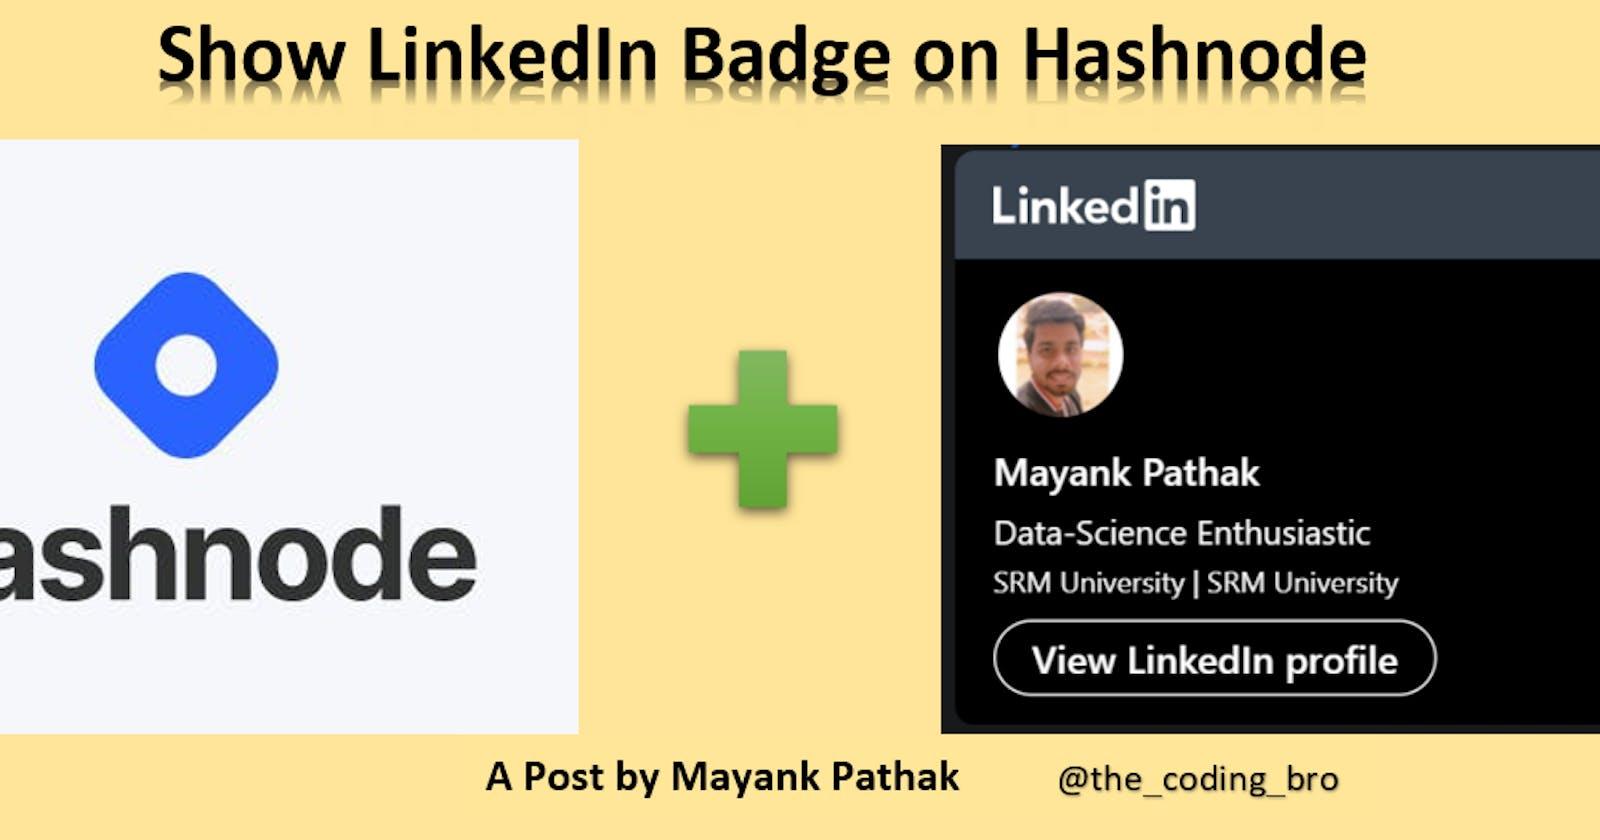 Show your LinkedIn Badge on Hashnode